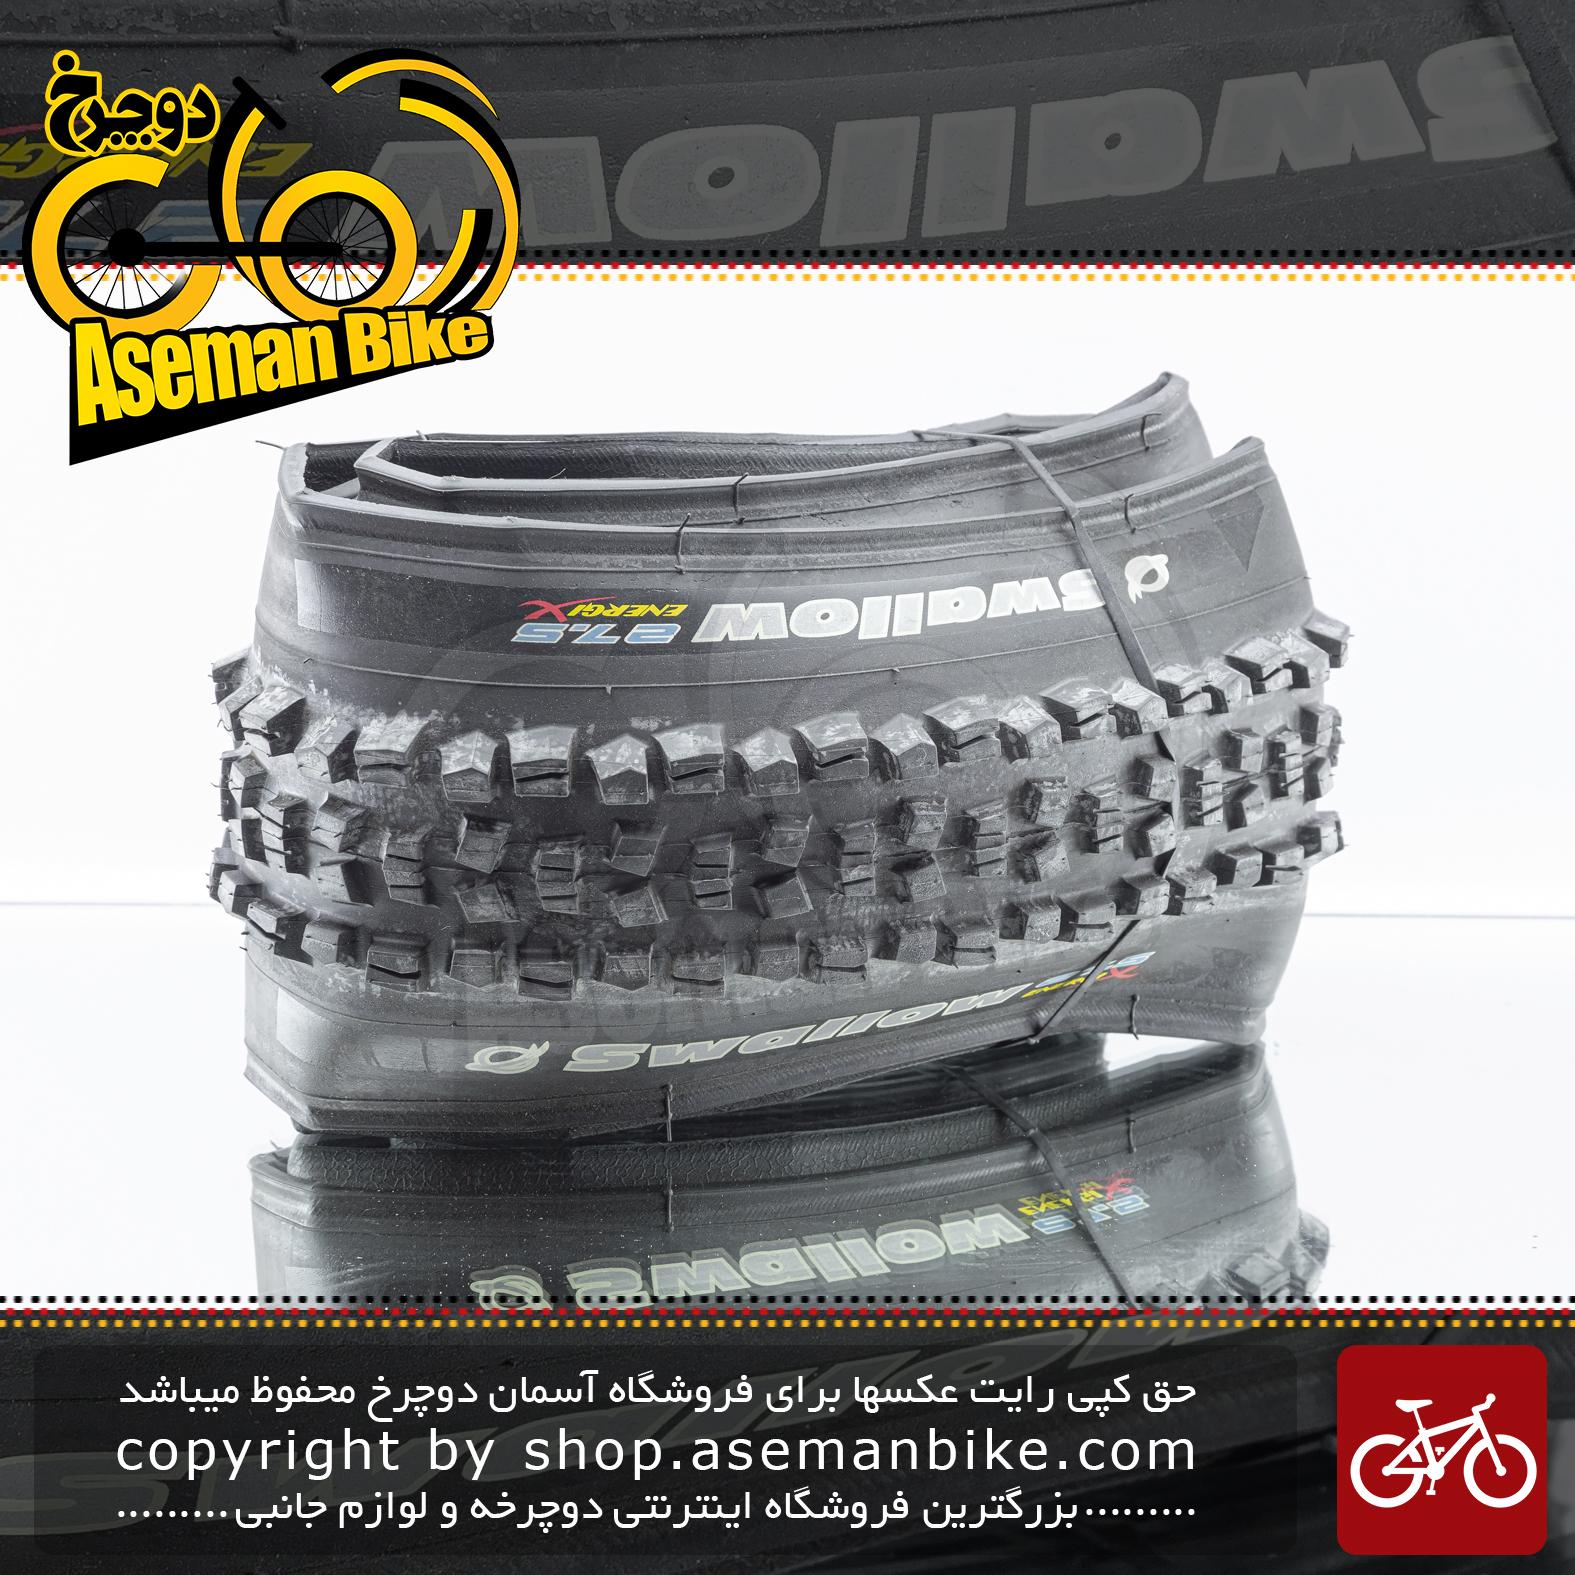 لاستیک تایر تاشو فولدینگ دوچرخه انرژی سالو سایز 27.5 در 2.25 عاج درشت Tire Bicycle Folding Swallow Energy 27.5x2.25